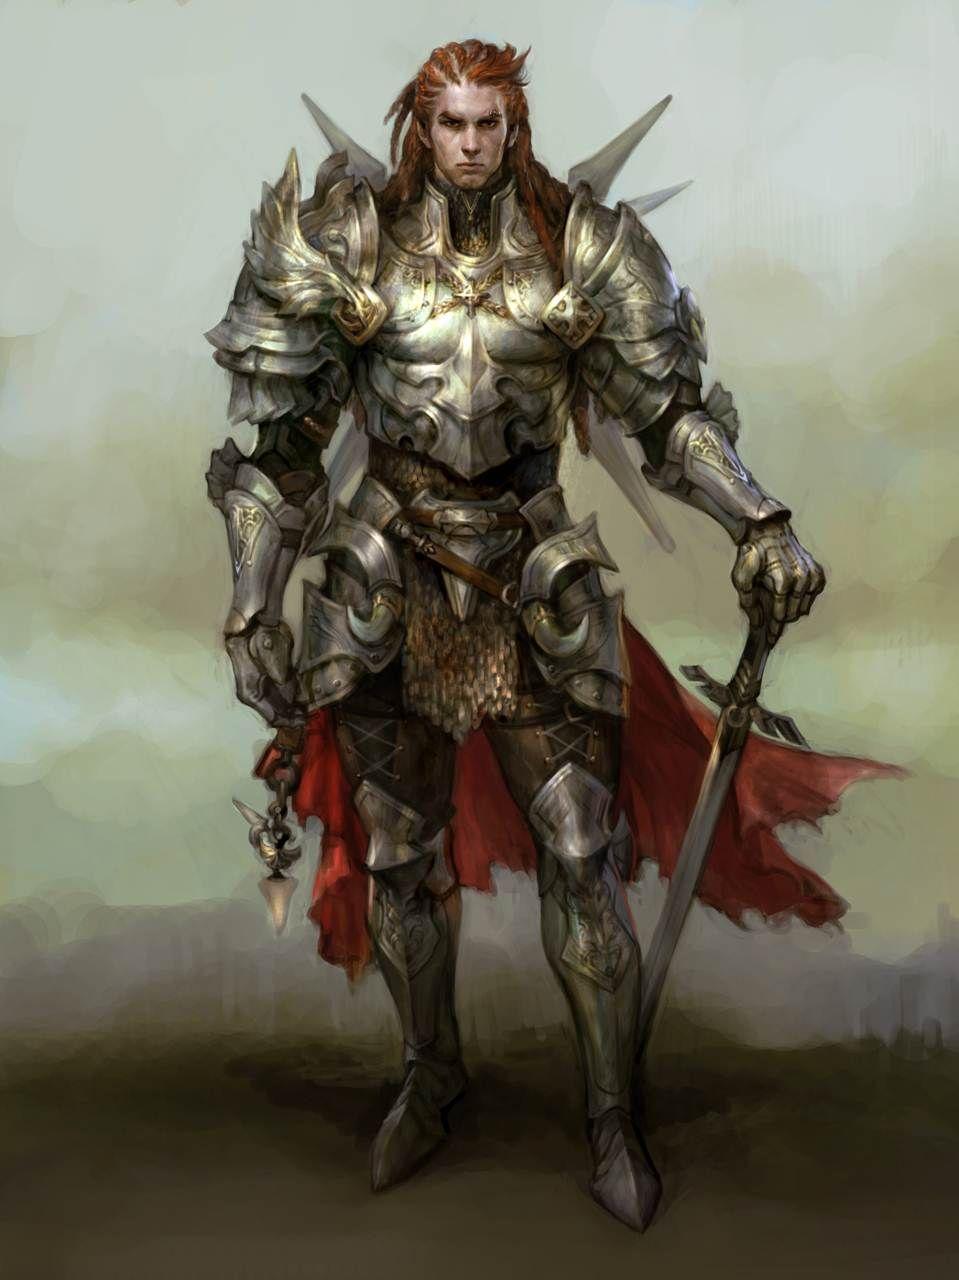 Dragon Knight Dragon Knight Fantasy Armor Concept Art Characters The most common dragon knight armor material is metal. dragon knight fantasy armor concept